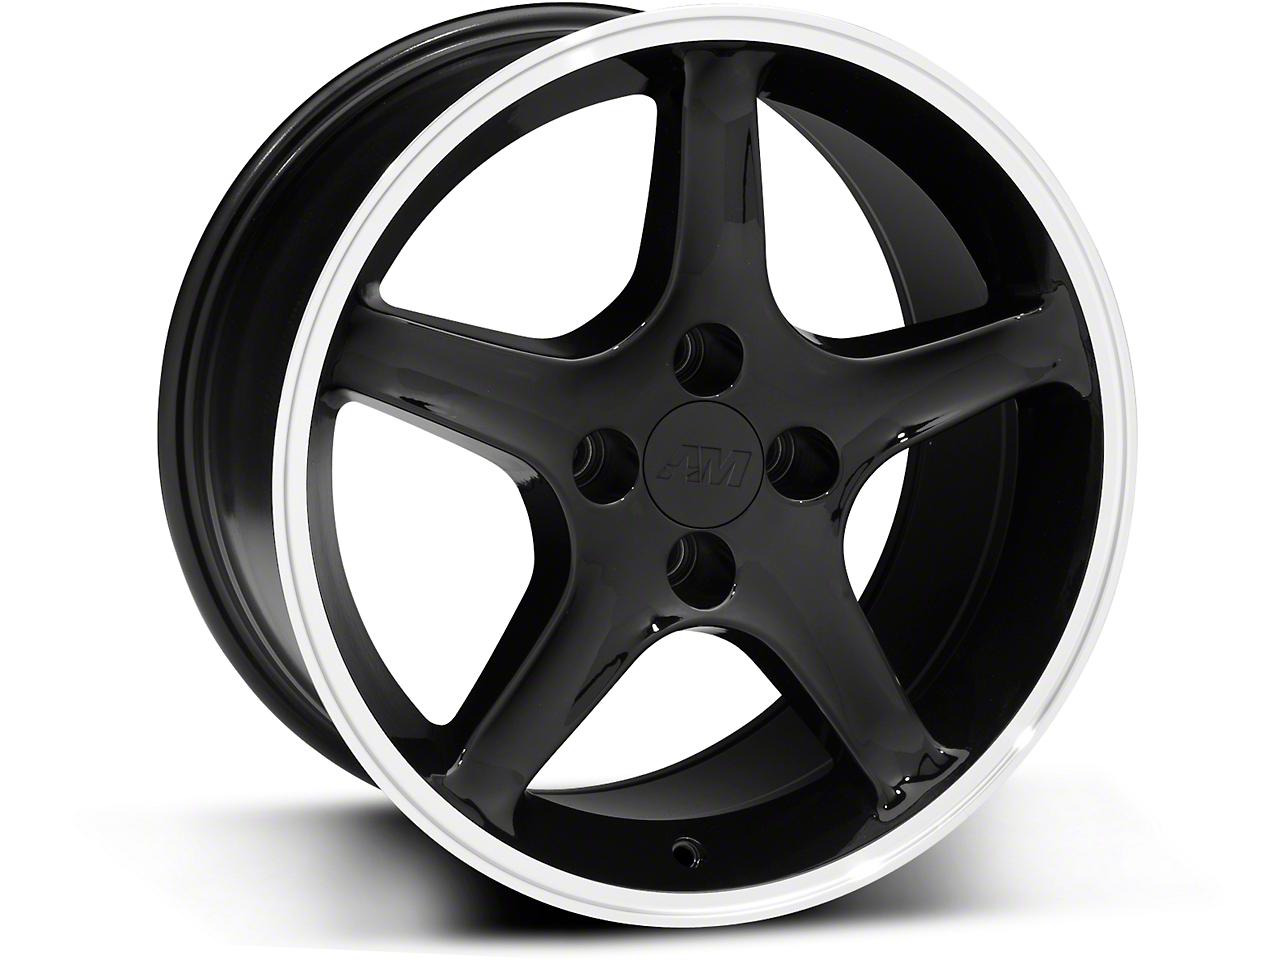 1995 Cobra R Style Black Wheel - 17x9 (87-93; Excludes 93 Cobra)